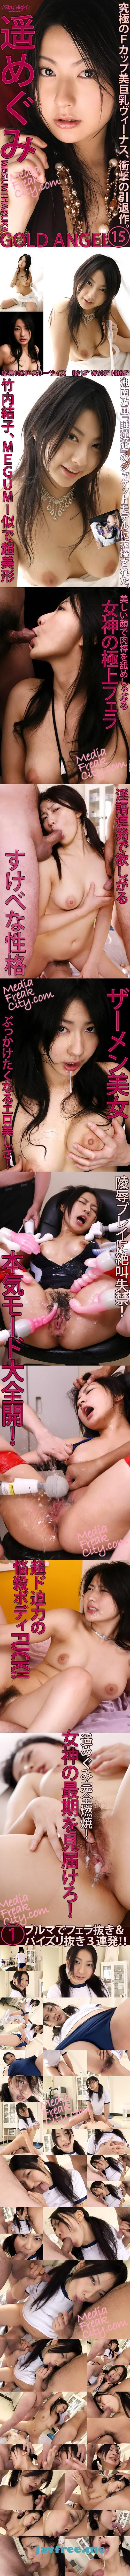 [SKY-125] Gold Angel Vol.15 : Megumi Haruka - image SKY-125a on https://javfree.me